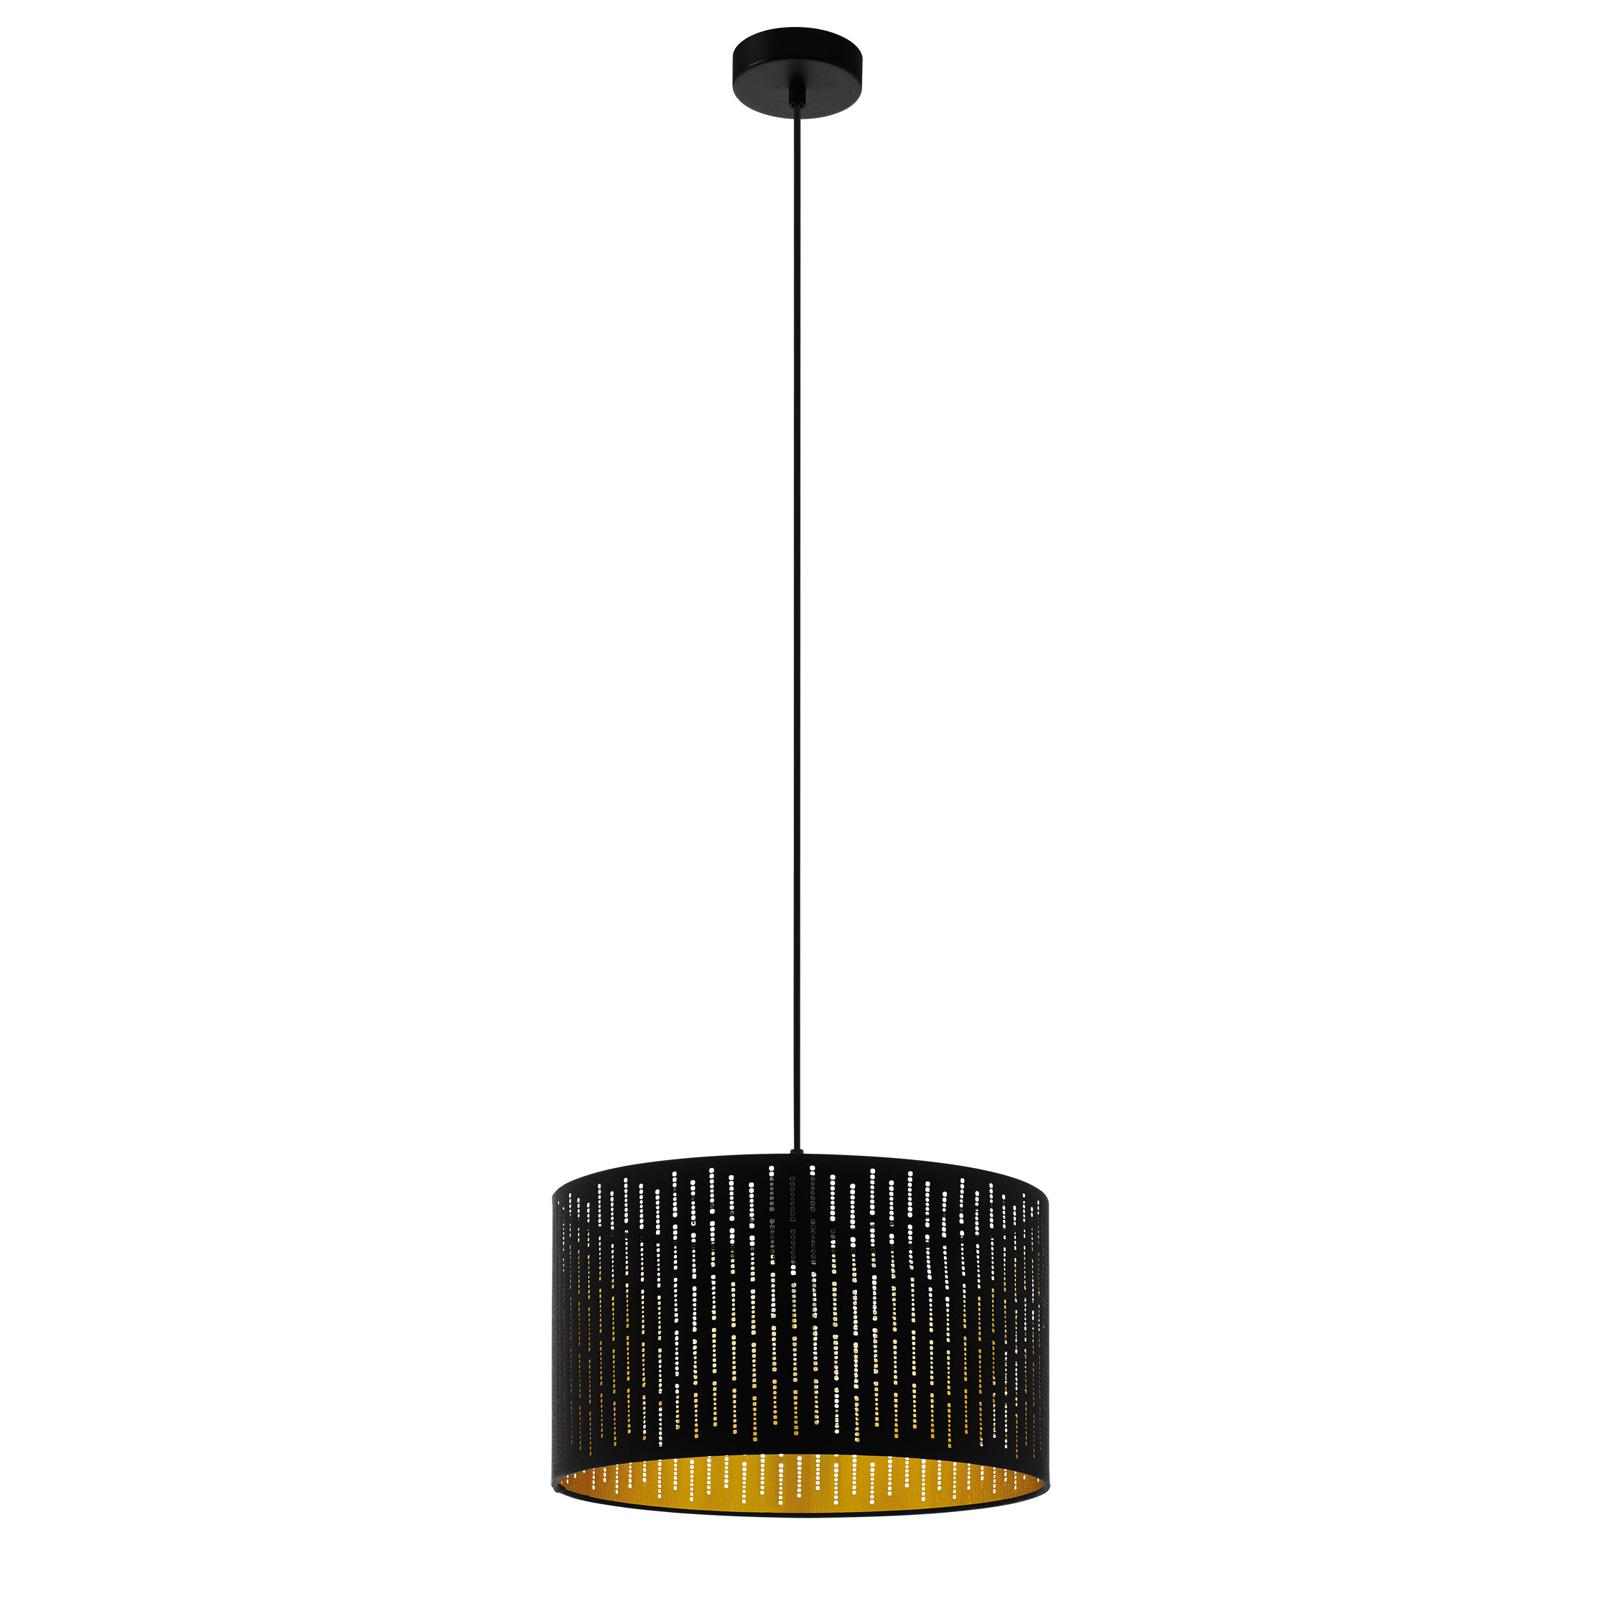 Lampa sufitowa Varillas czarna/złota, 38 cm